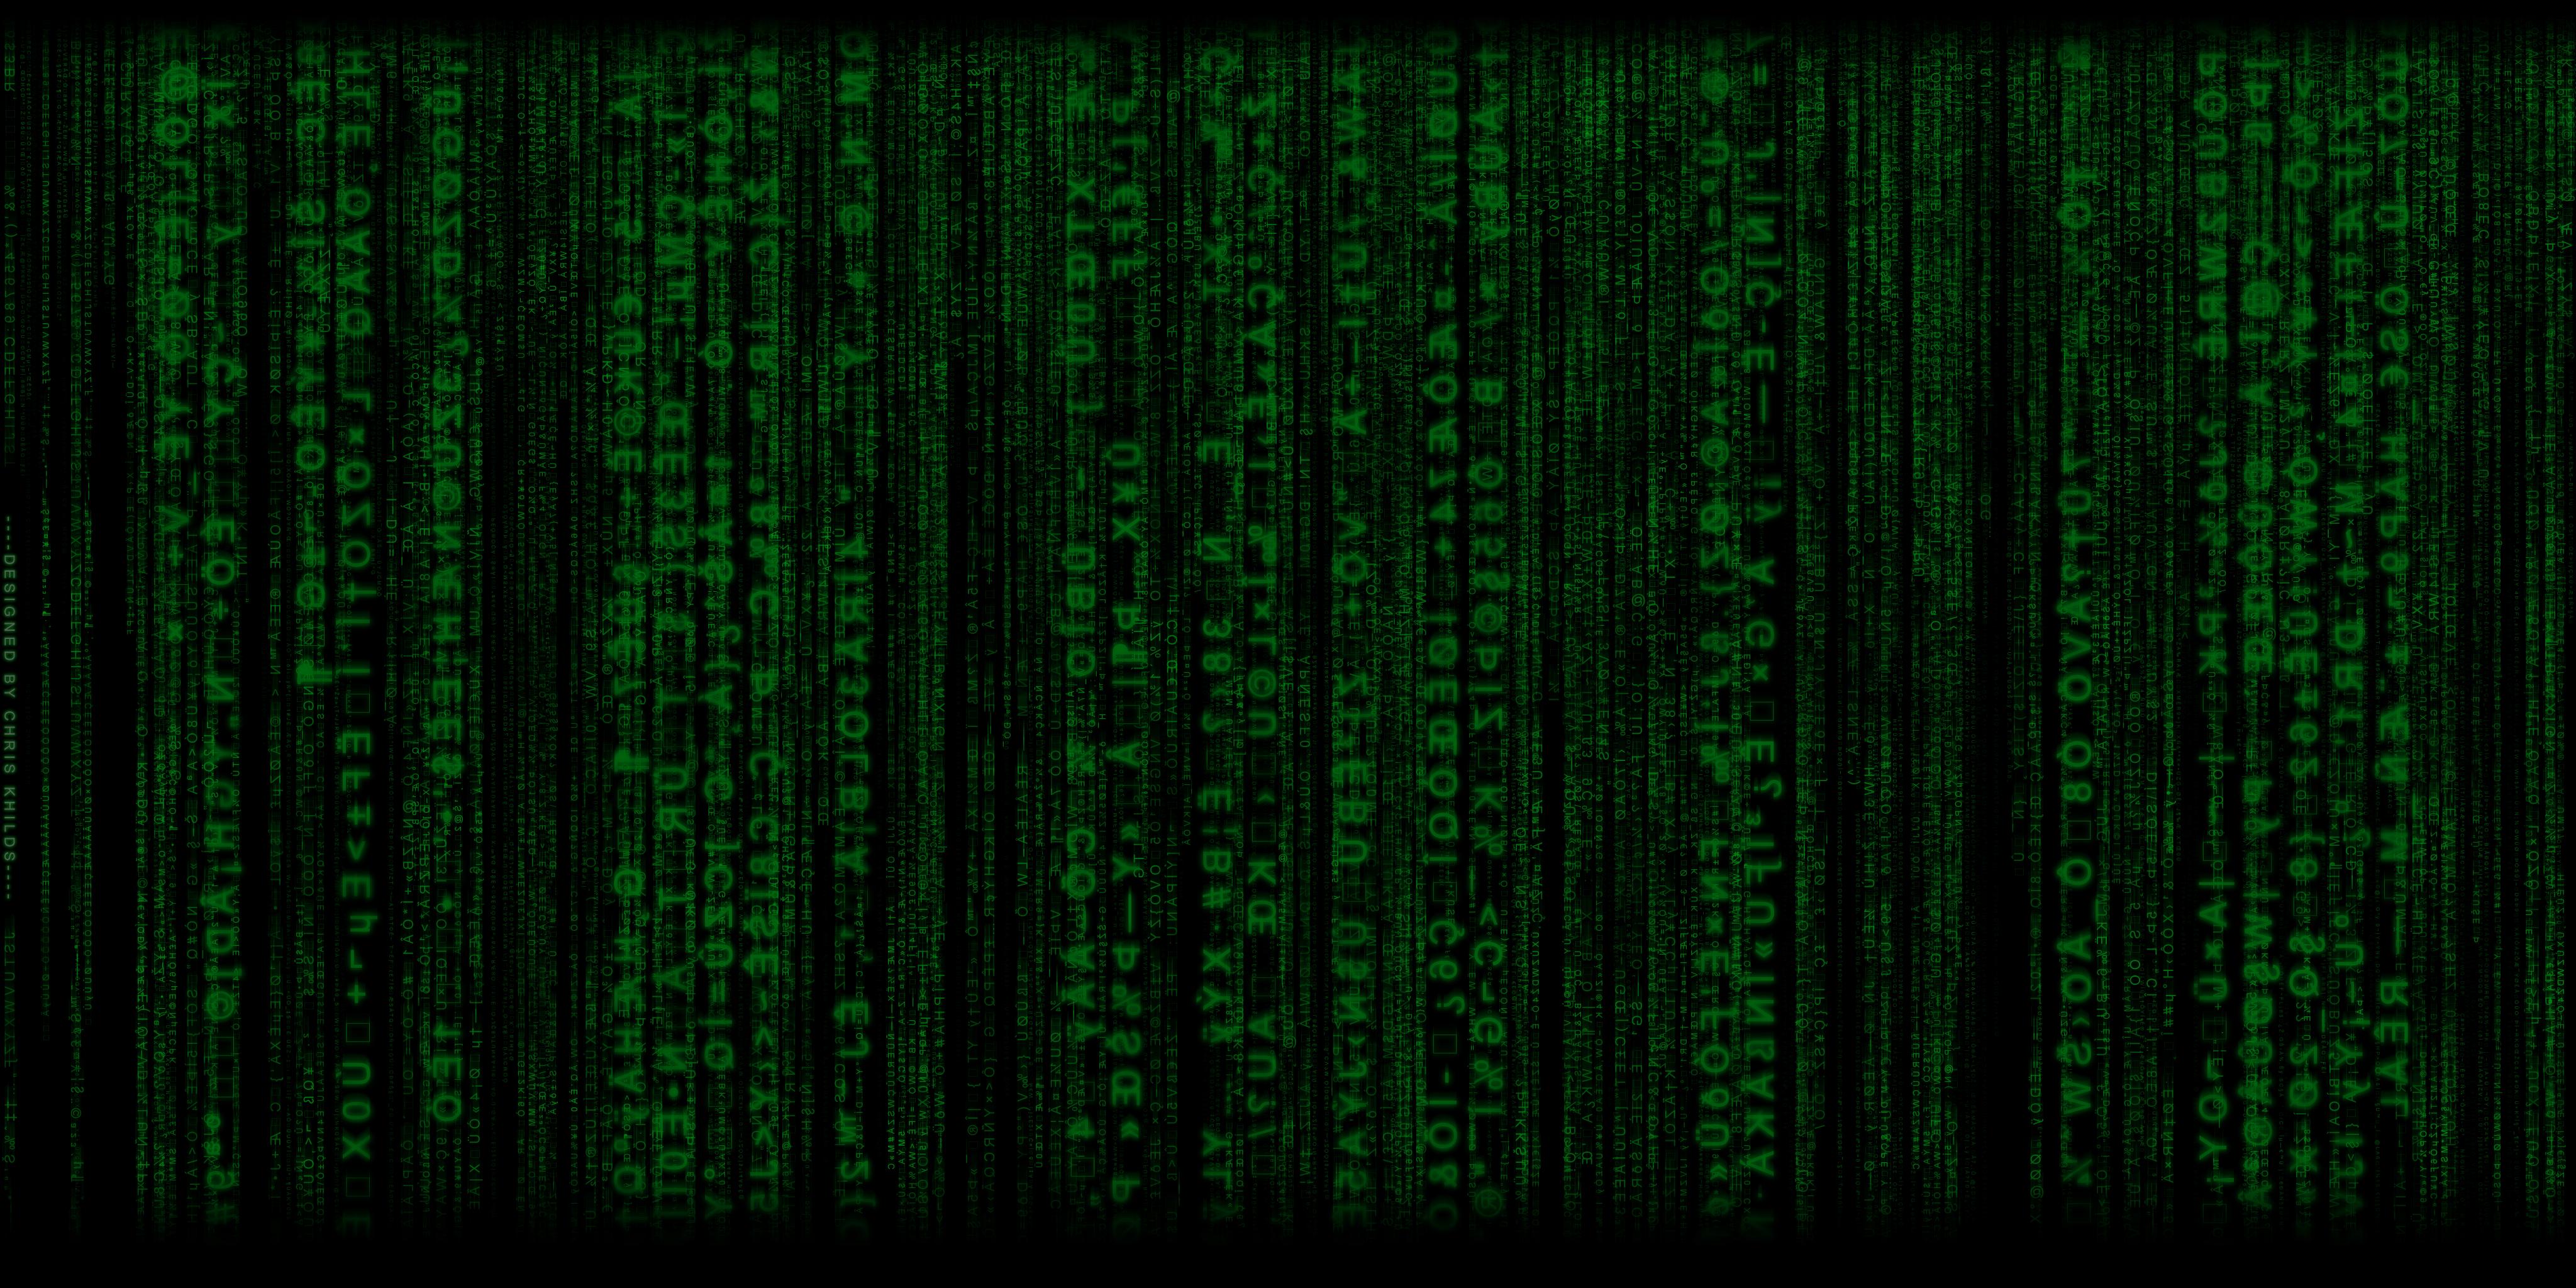 Matrix Code skydome v2.05 by Big-Bohn on DeviantArt